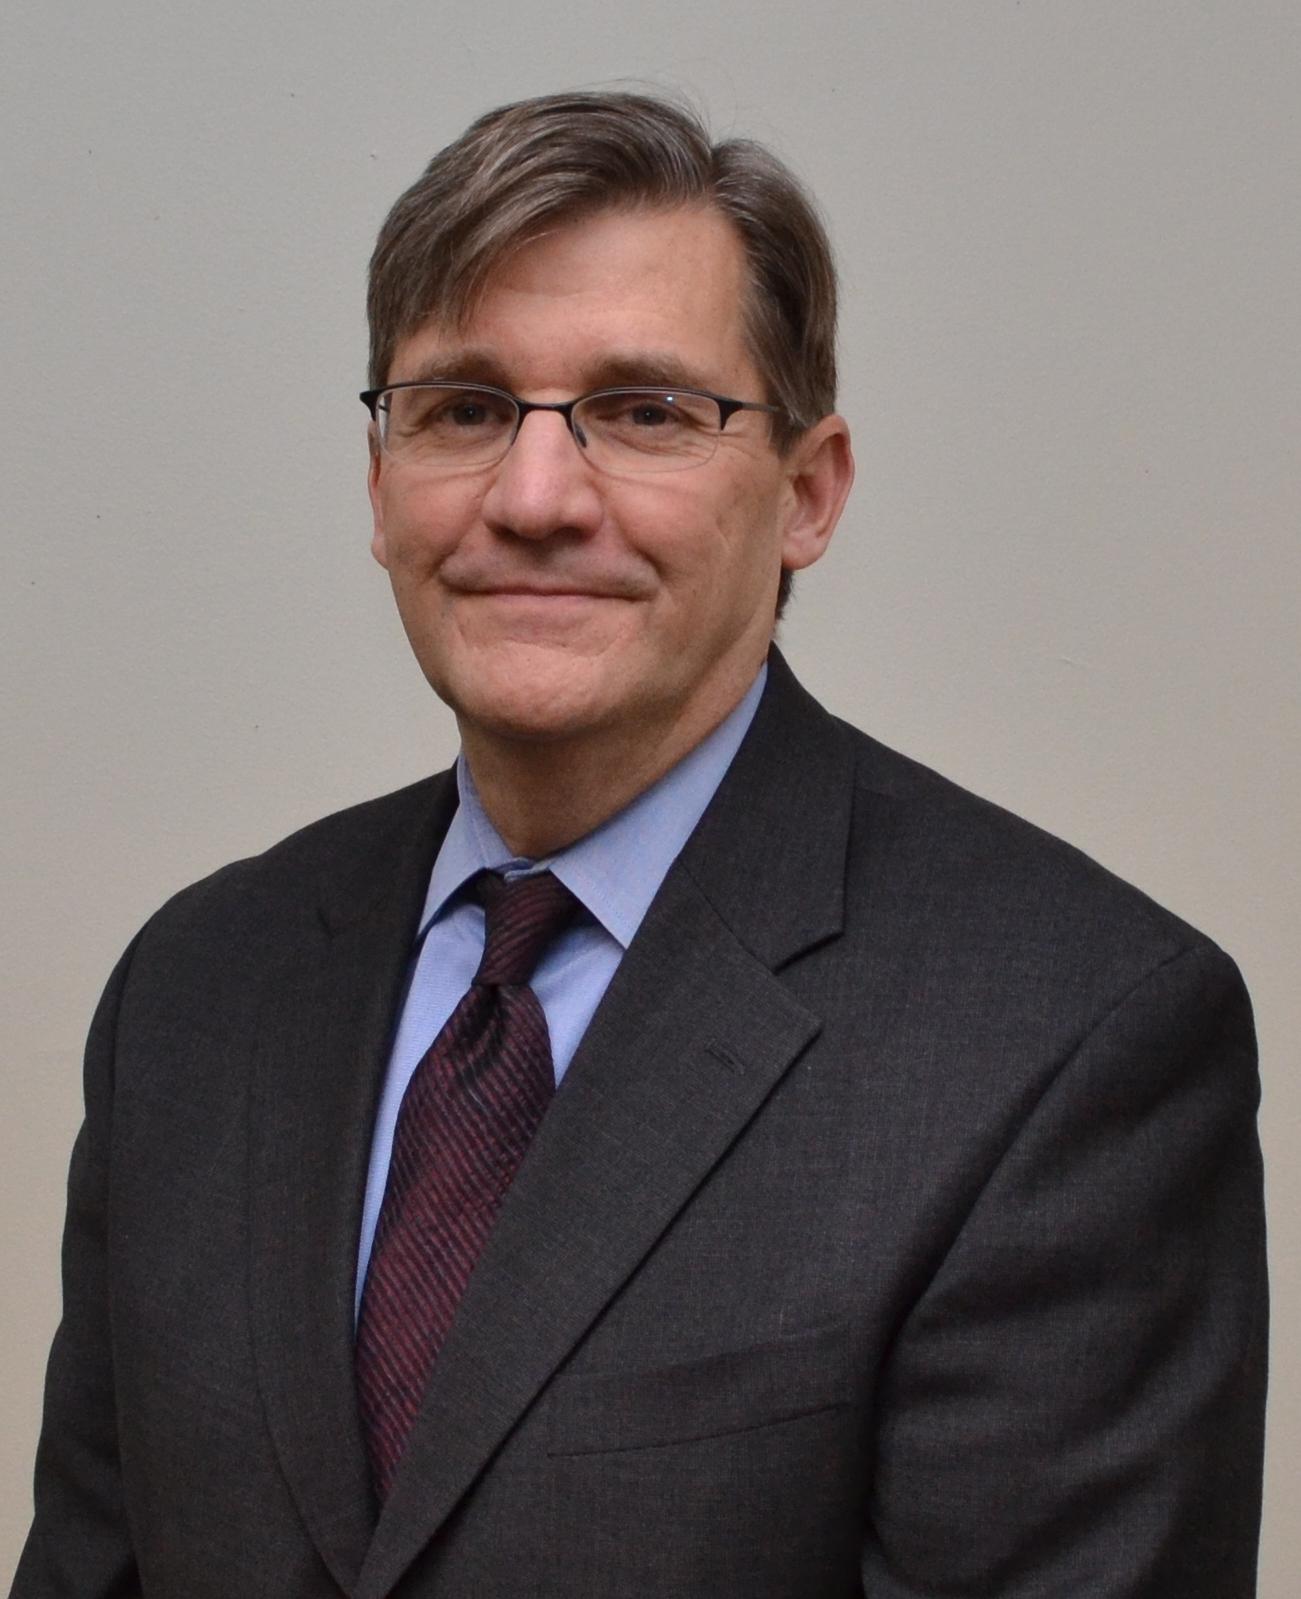 Patrick Costigan (Photo: Business Wire)